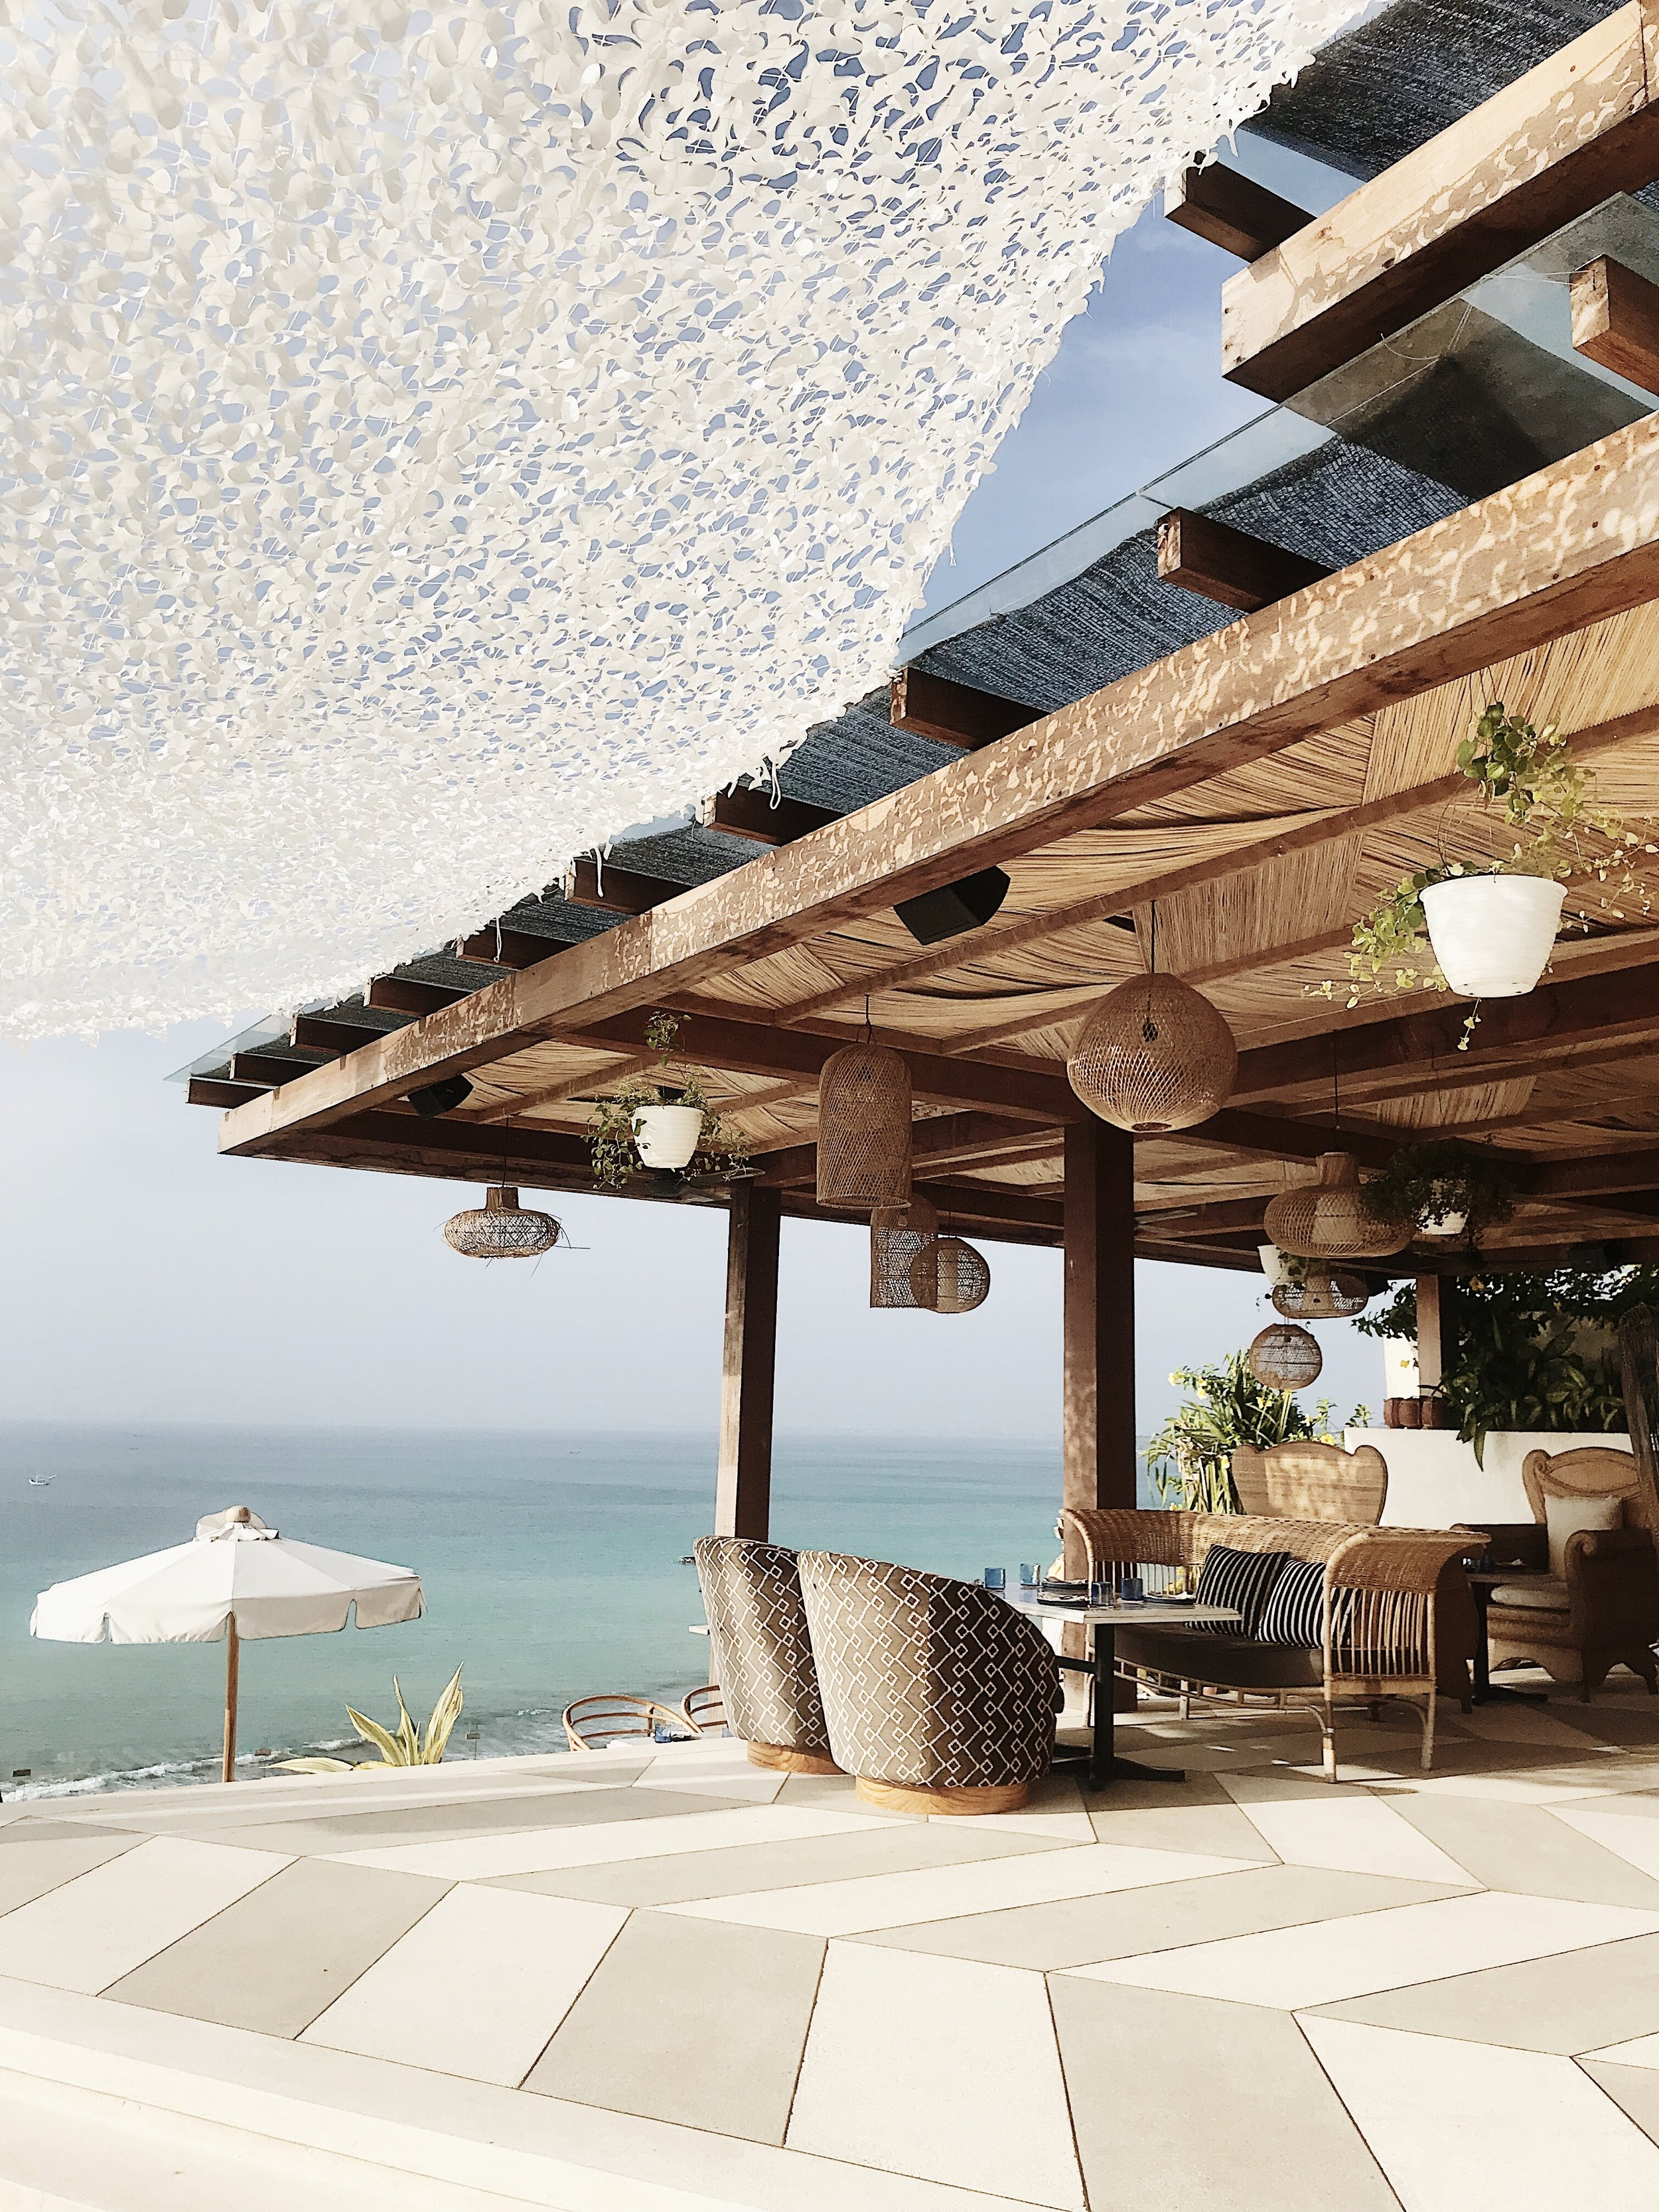 Ulu Cliff House, Bali, Indonesia